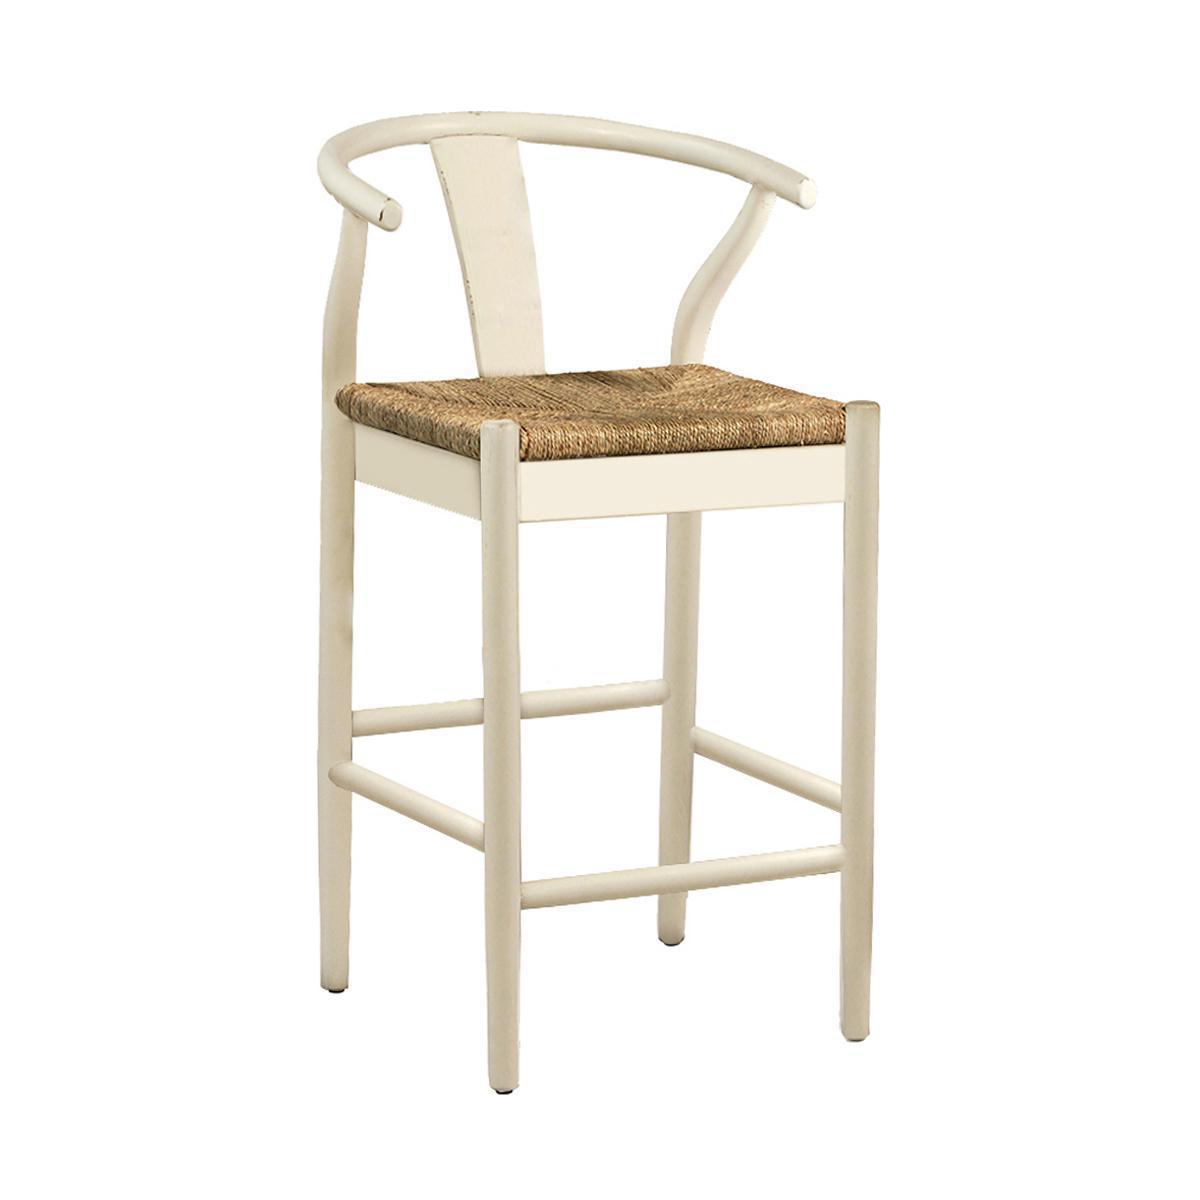 White Woven Oak Counter Stool Chairish